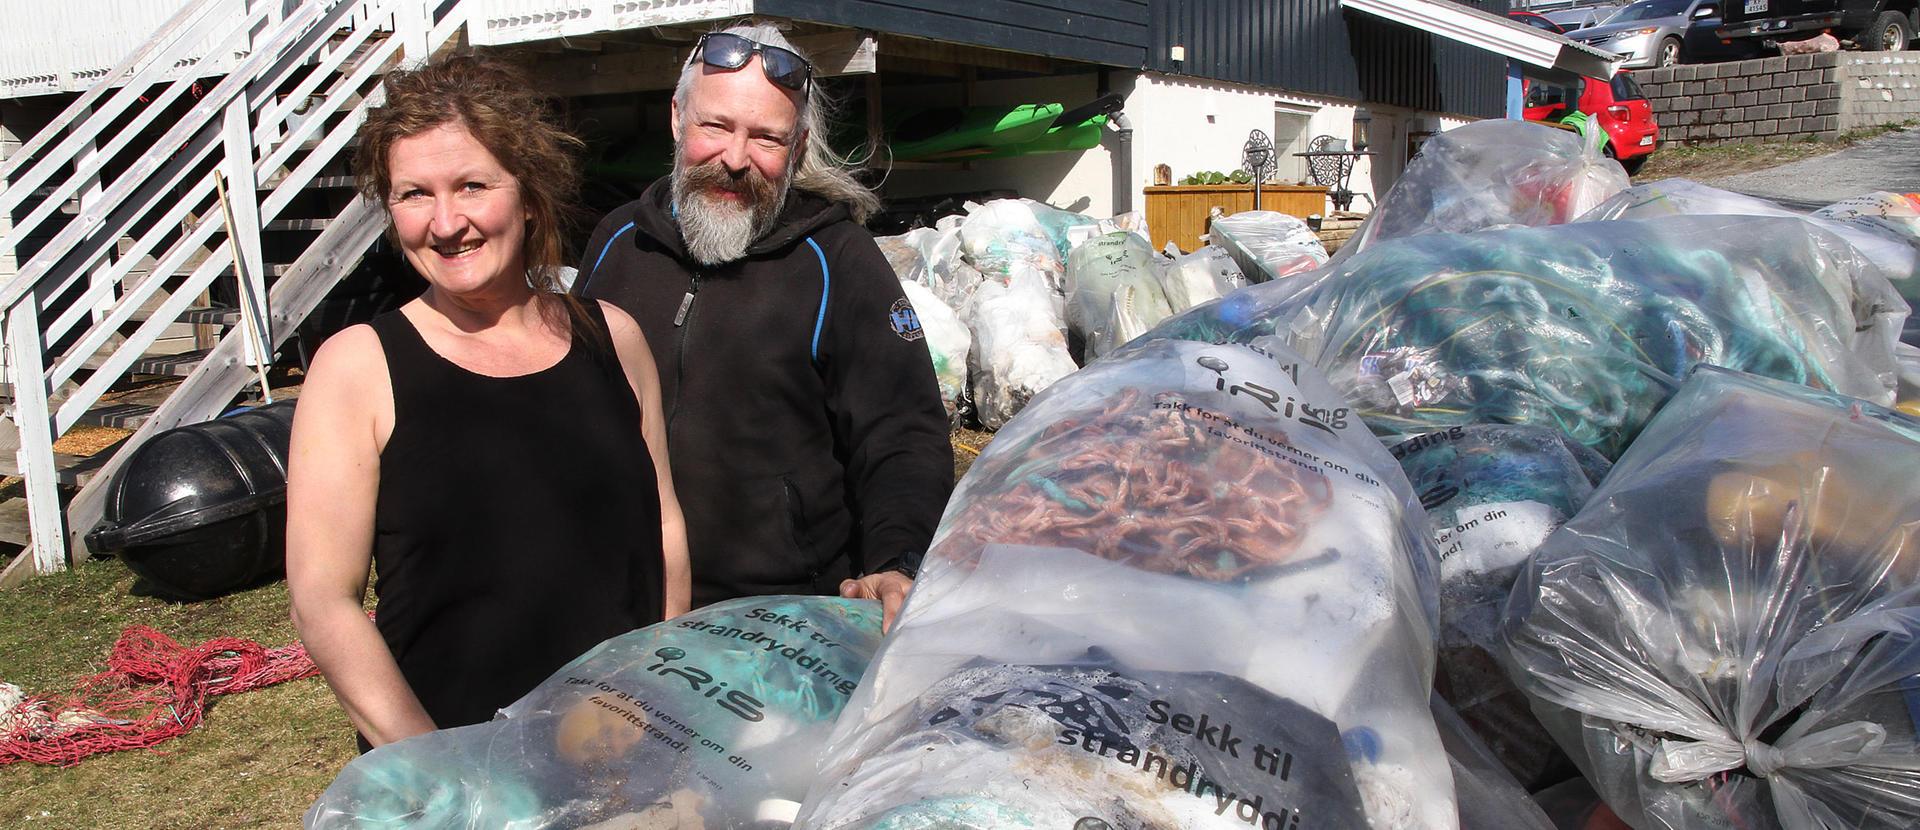 Samboerparet har samlet 1550 kilo marint avfall.